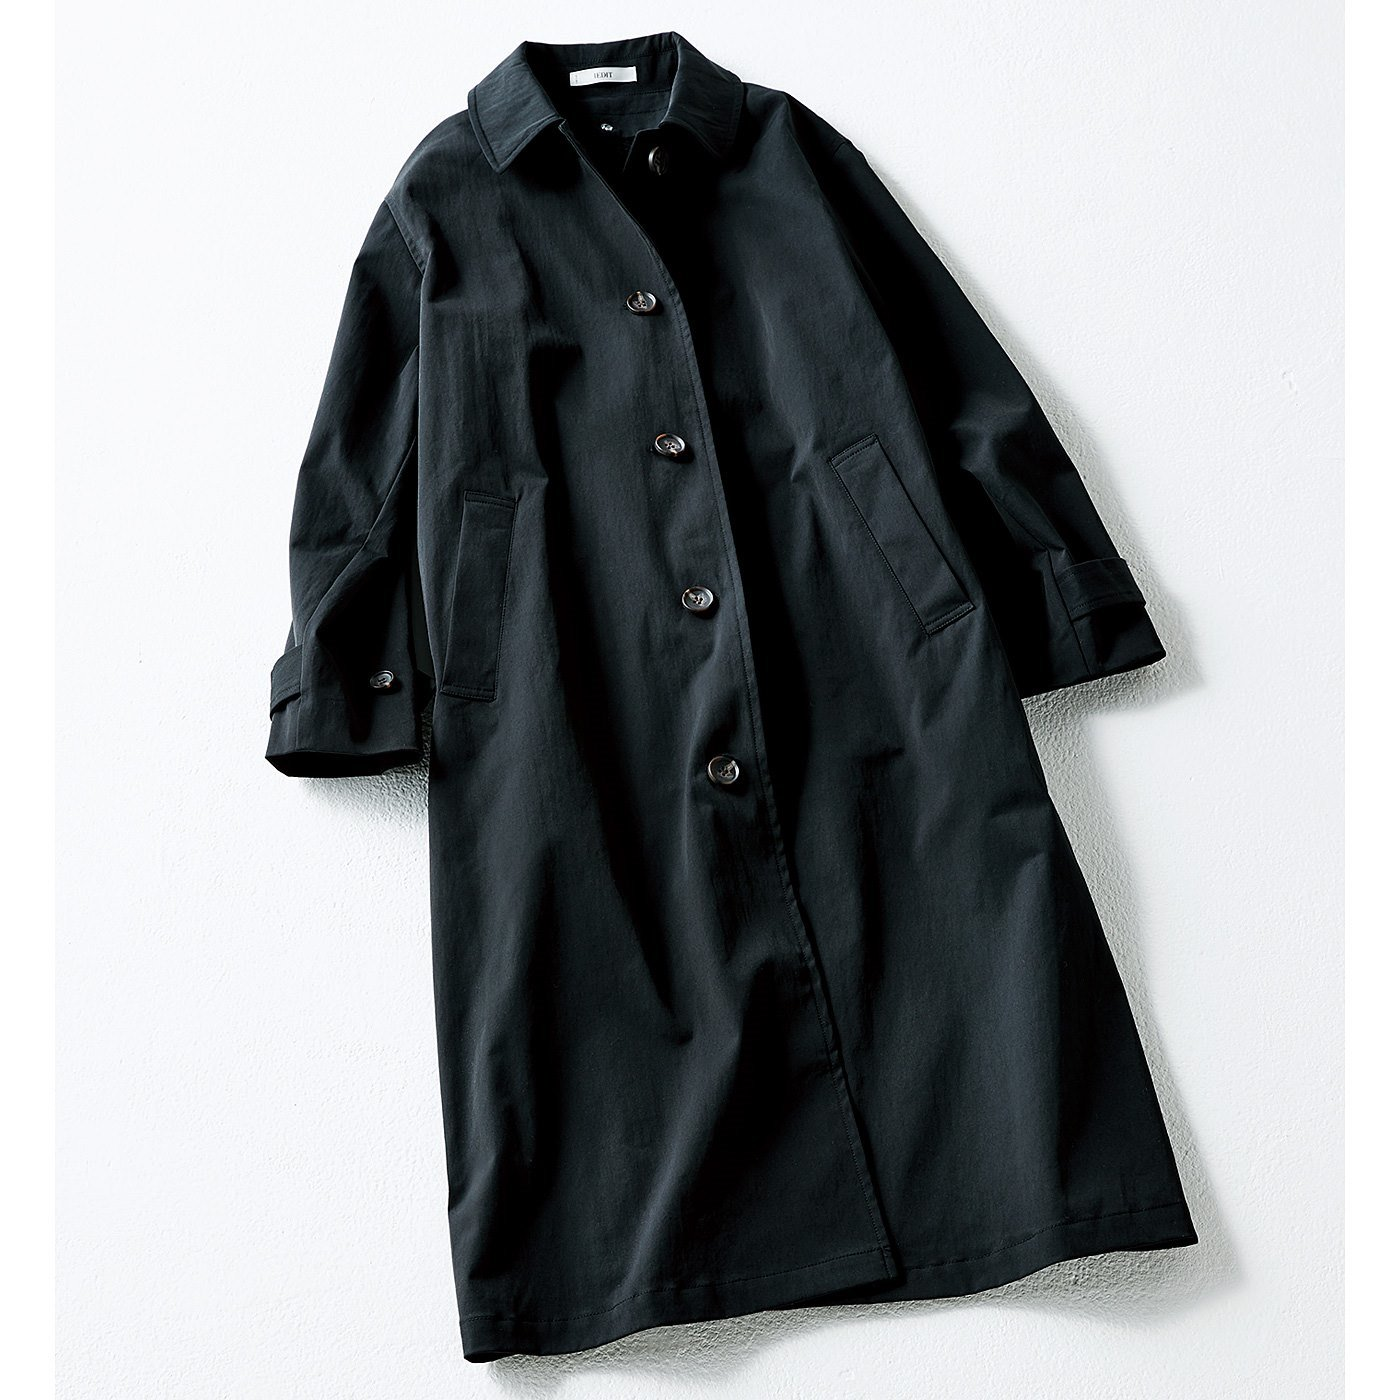 IEDIT TEXBRID(R)素材の裏ボアステンカラーコート〈ブラック〉